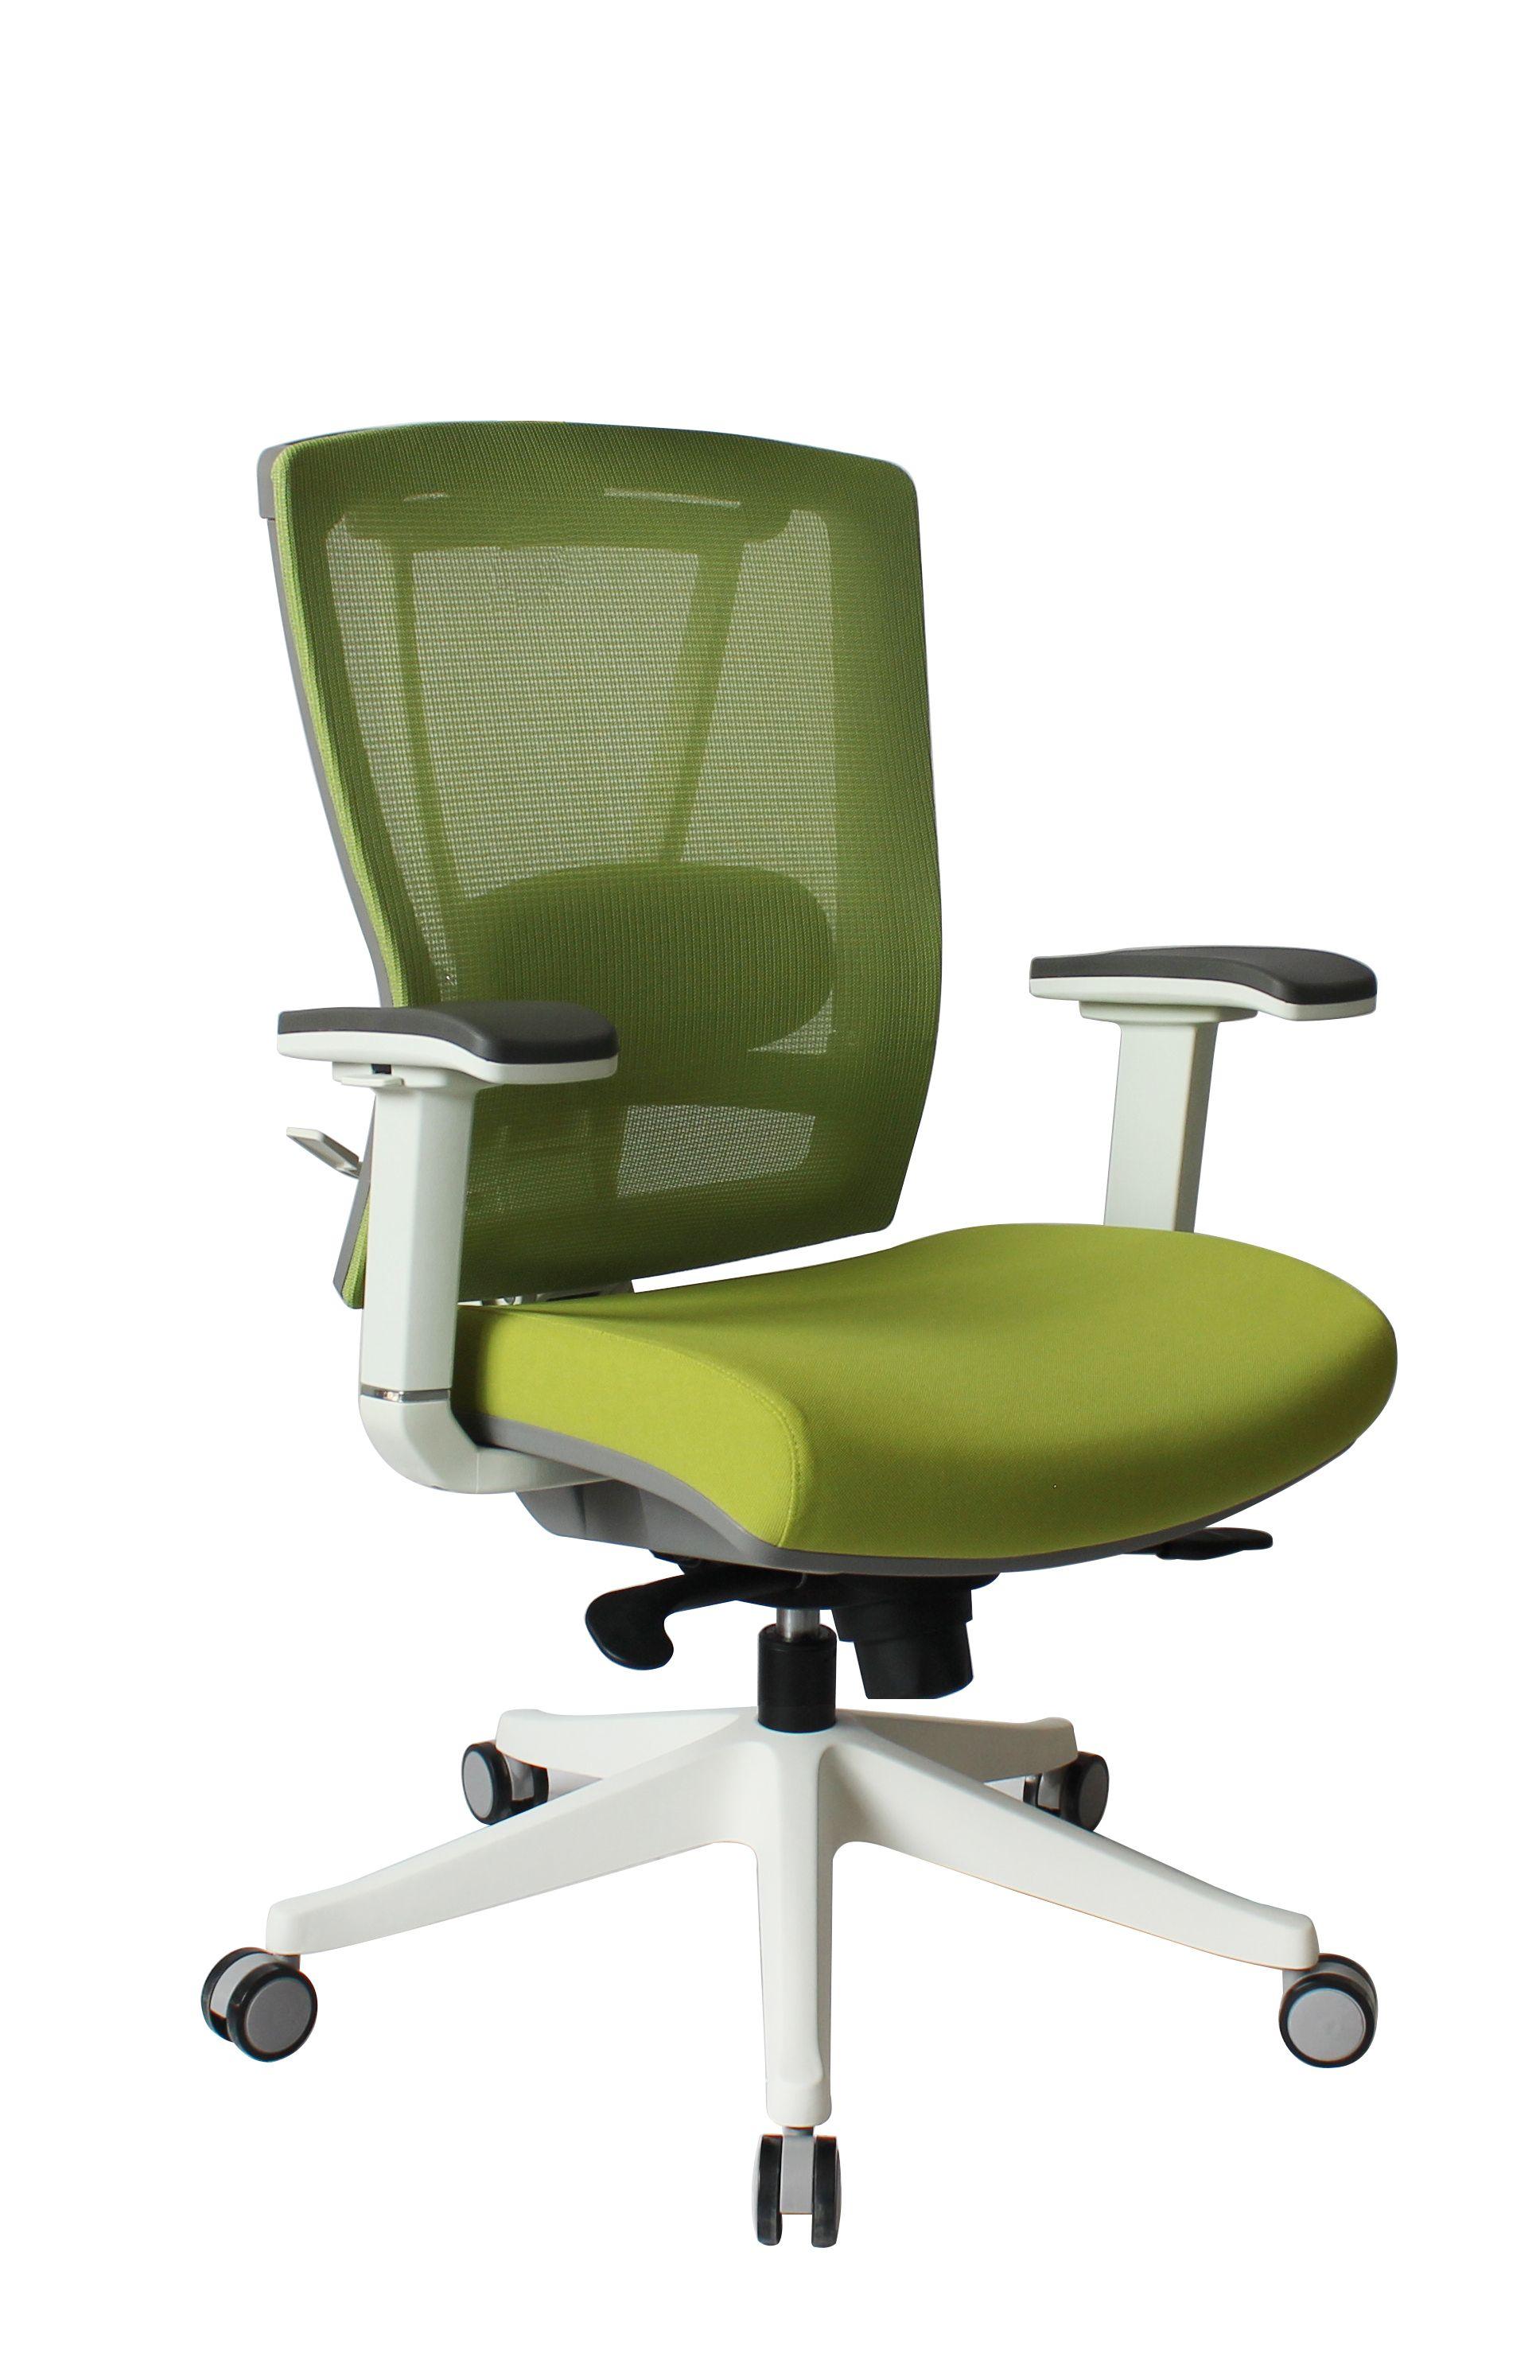 Outstanding Seat Lift Frieze - Custom Bathtubs - kazenomise.net